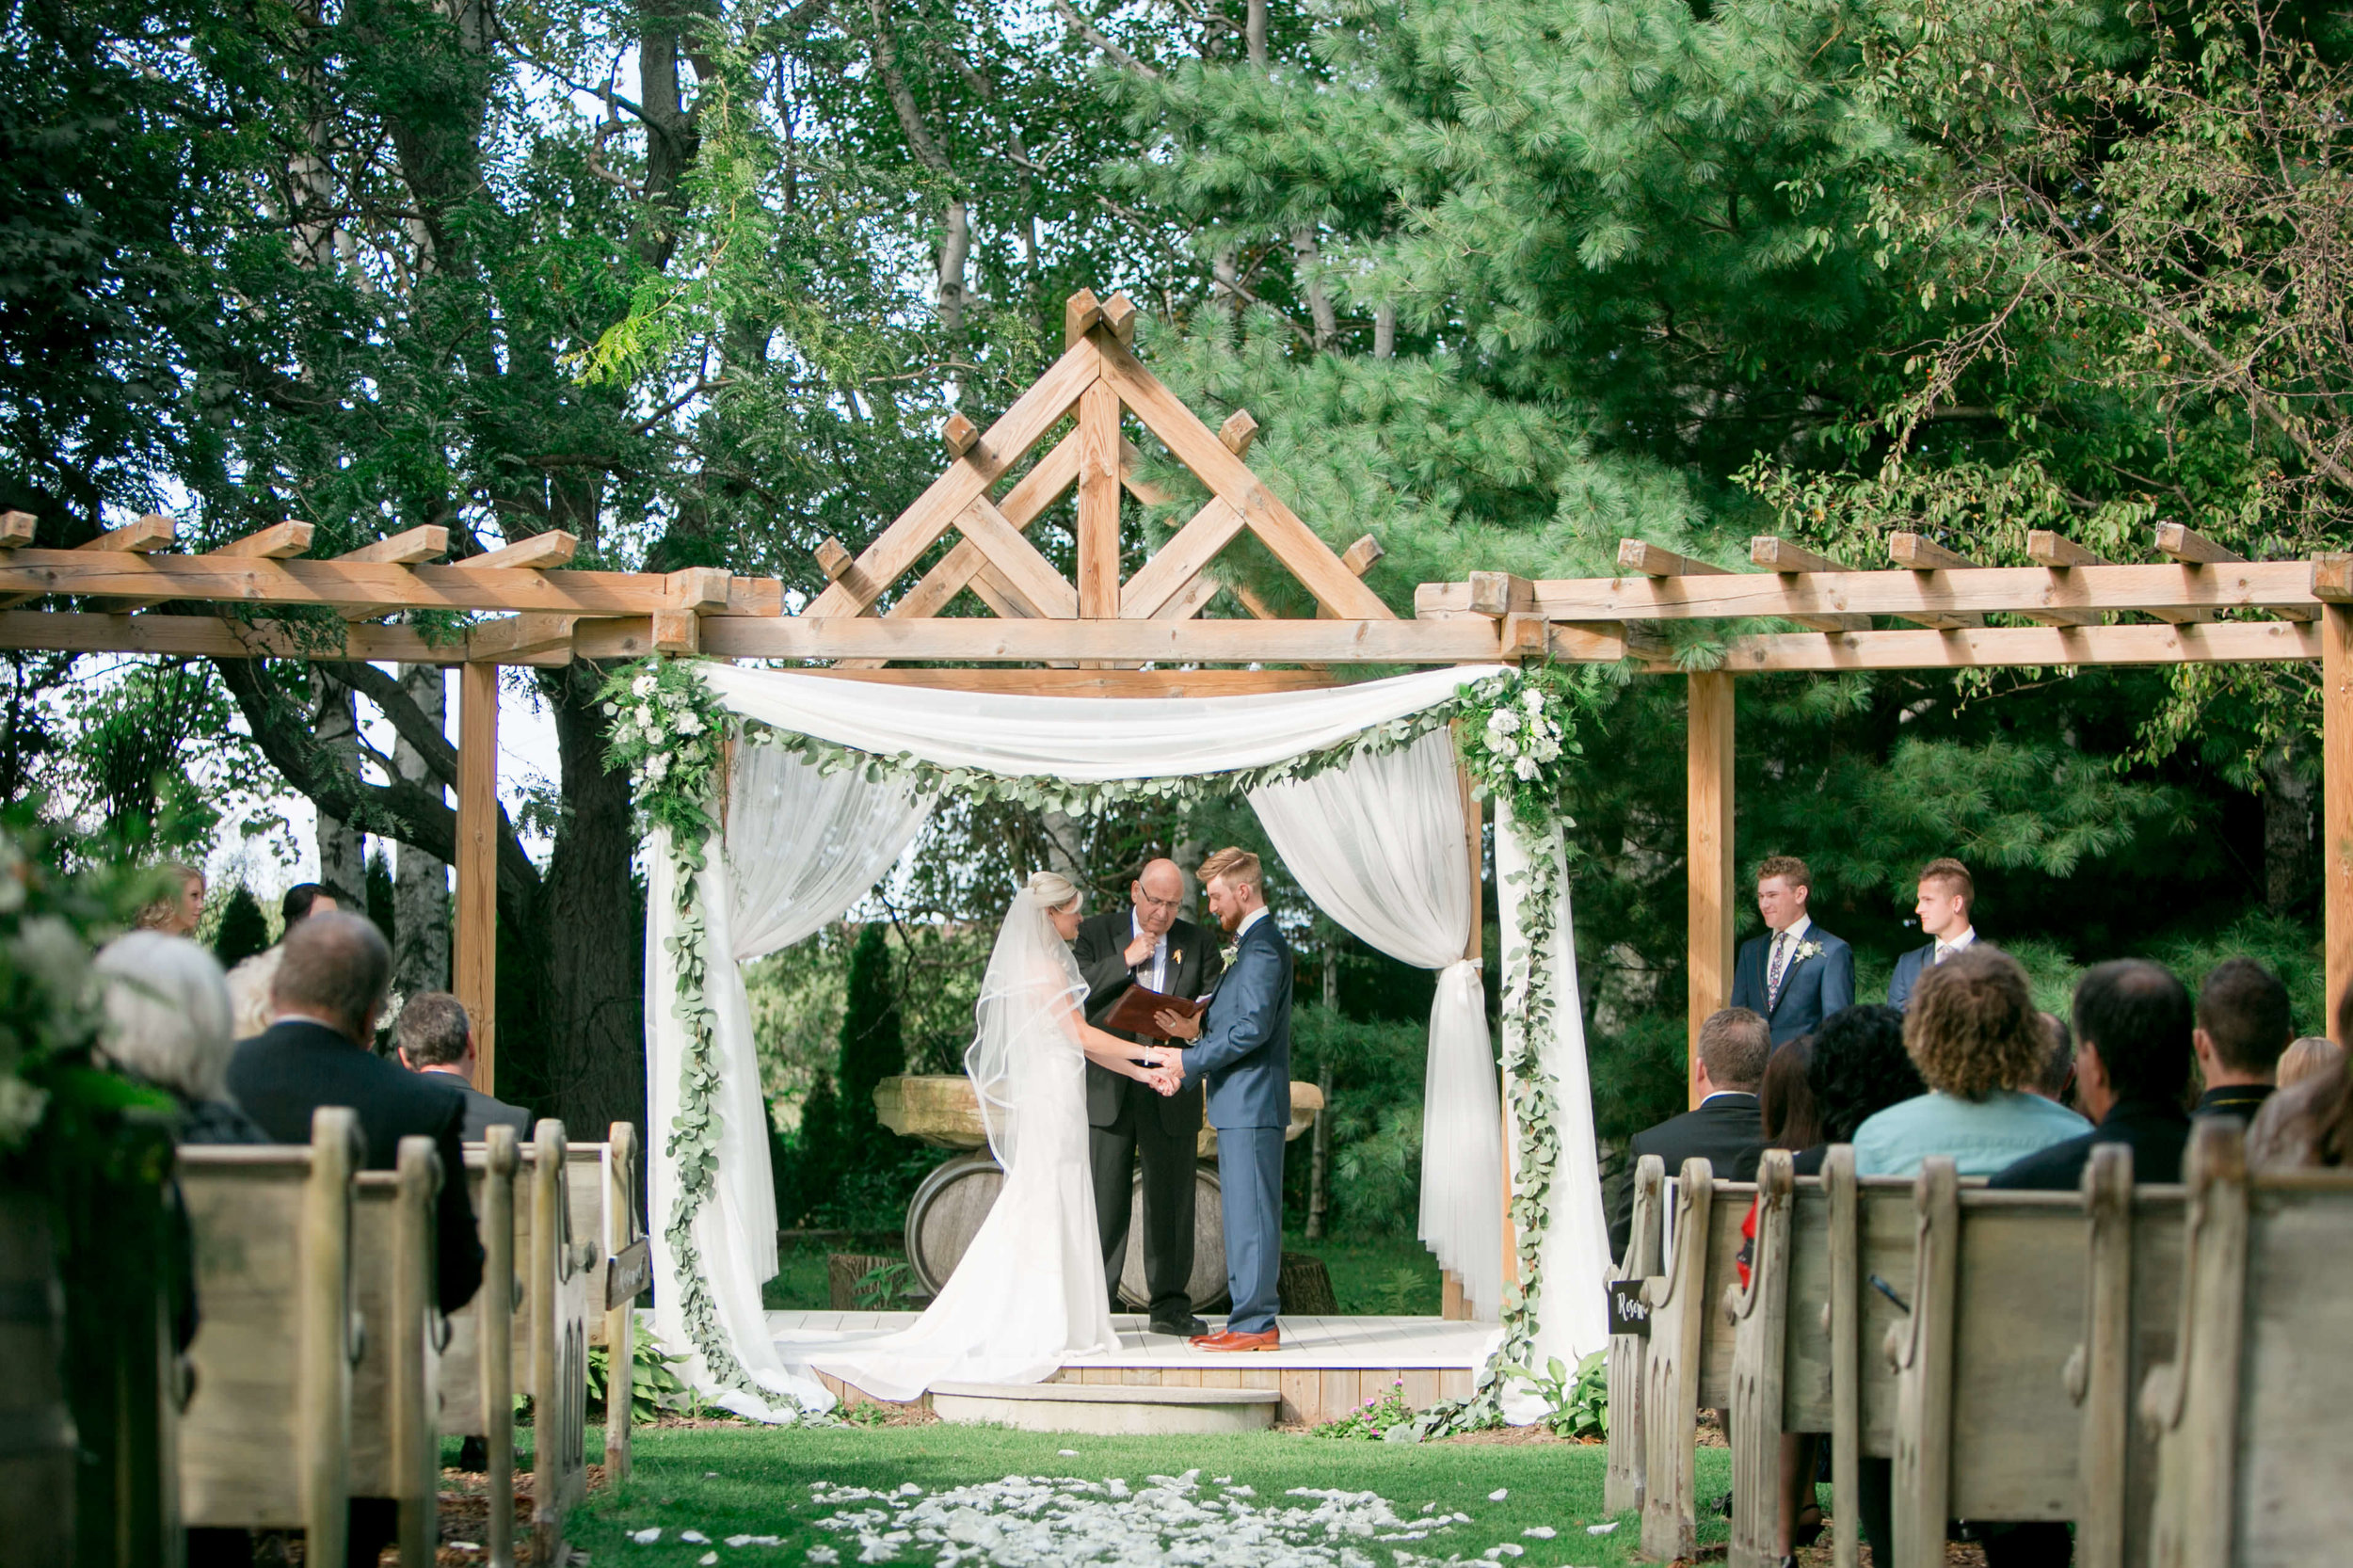 Maddy___Brandon___Daniel_Ricci_Weddings_High_Res._Finals_270.jpg